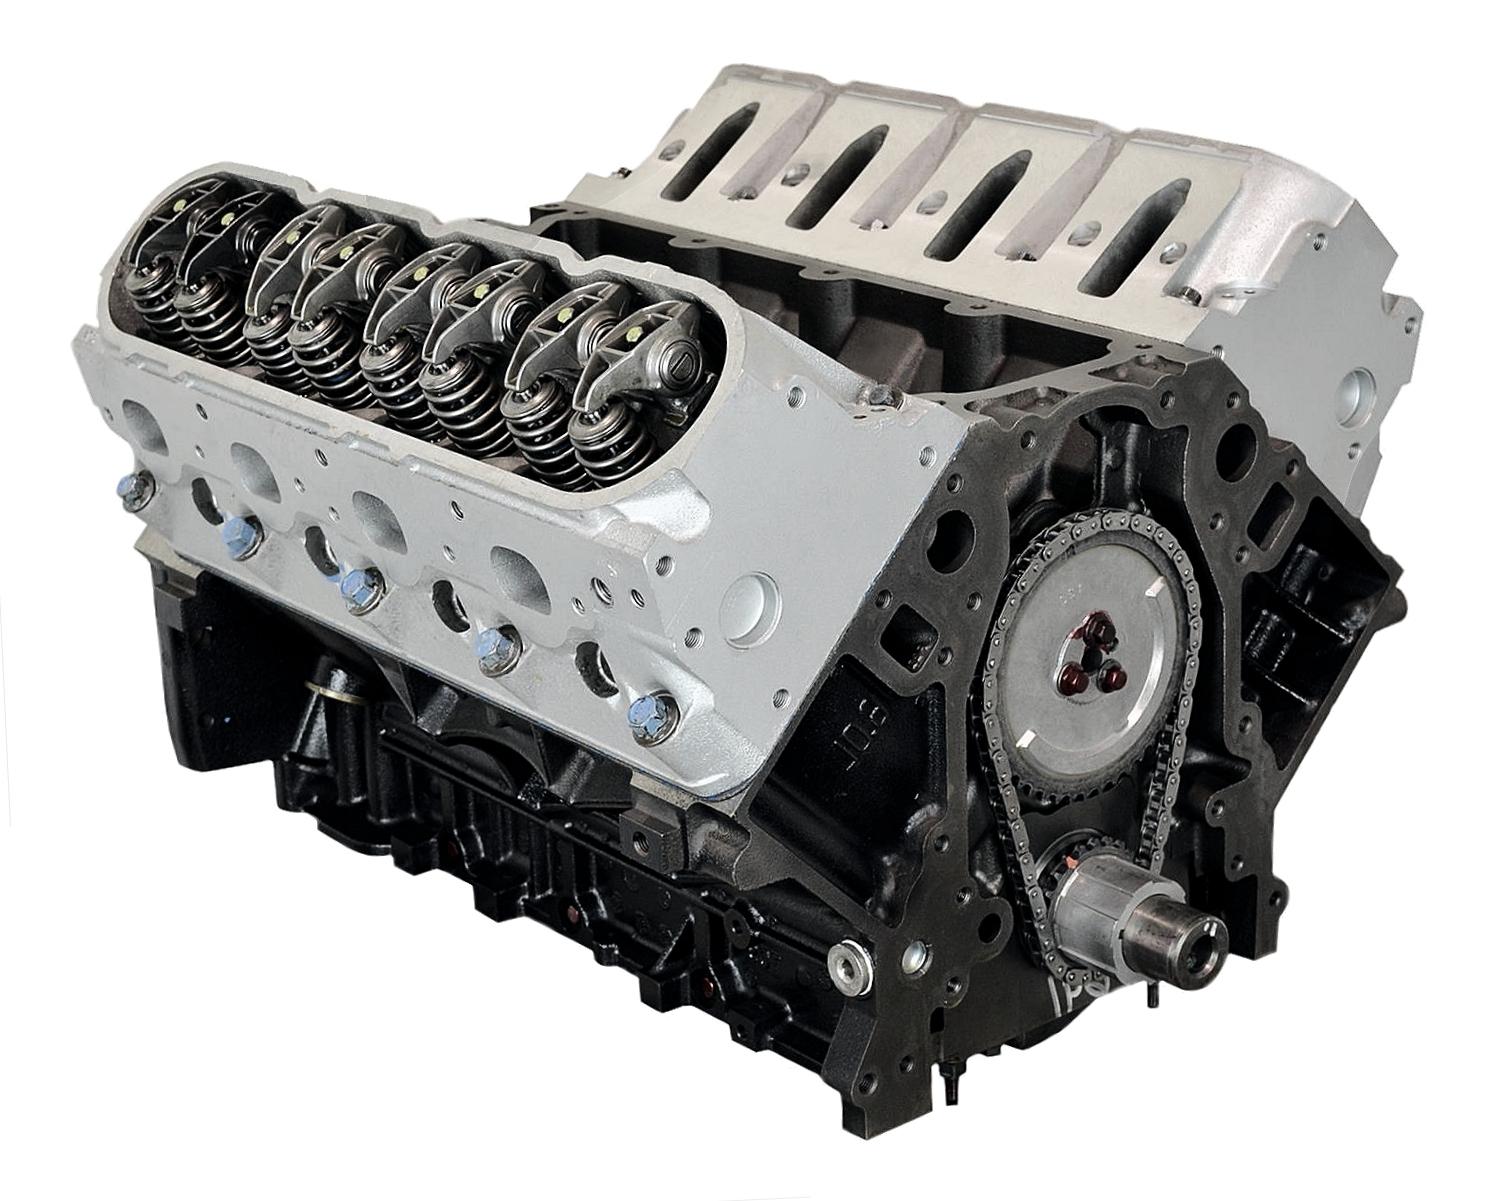 Chevrolet Silverado 2500 - 5.3 LM7 Engine - 1999-2000 (Vin Code: T)